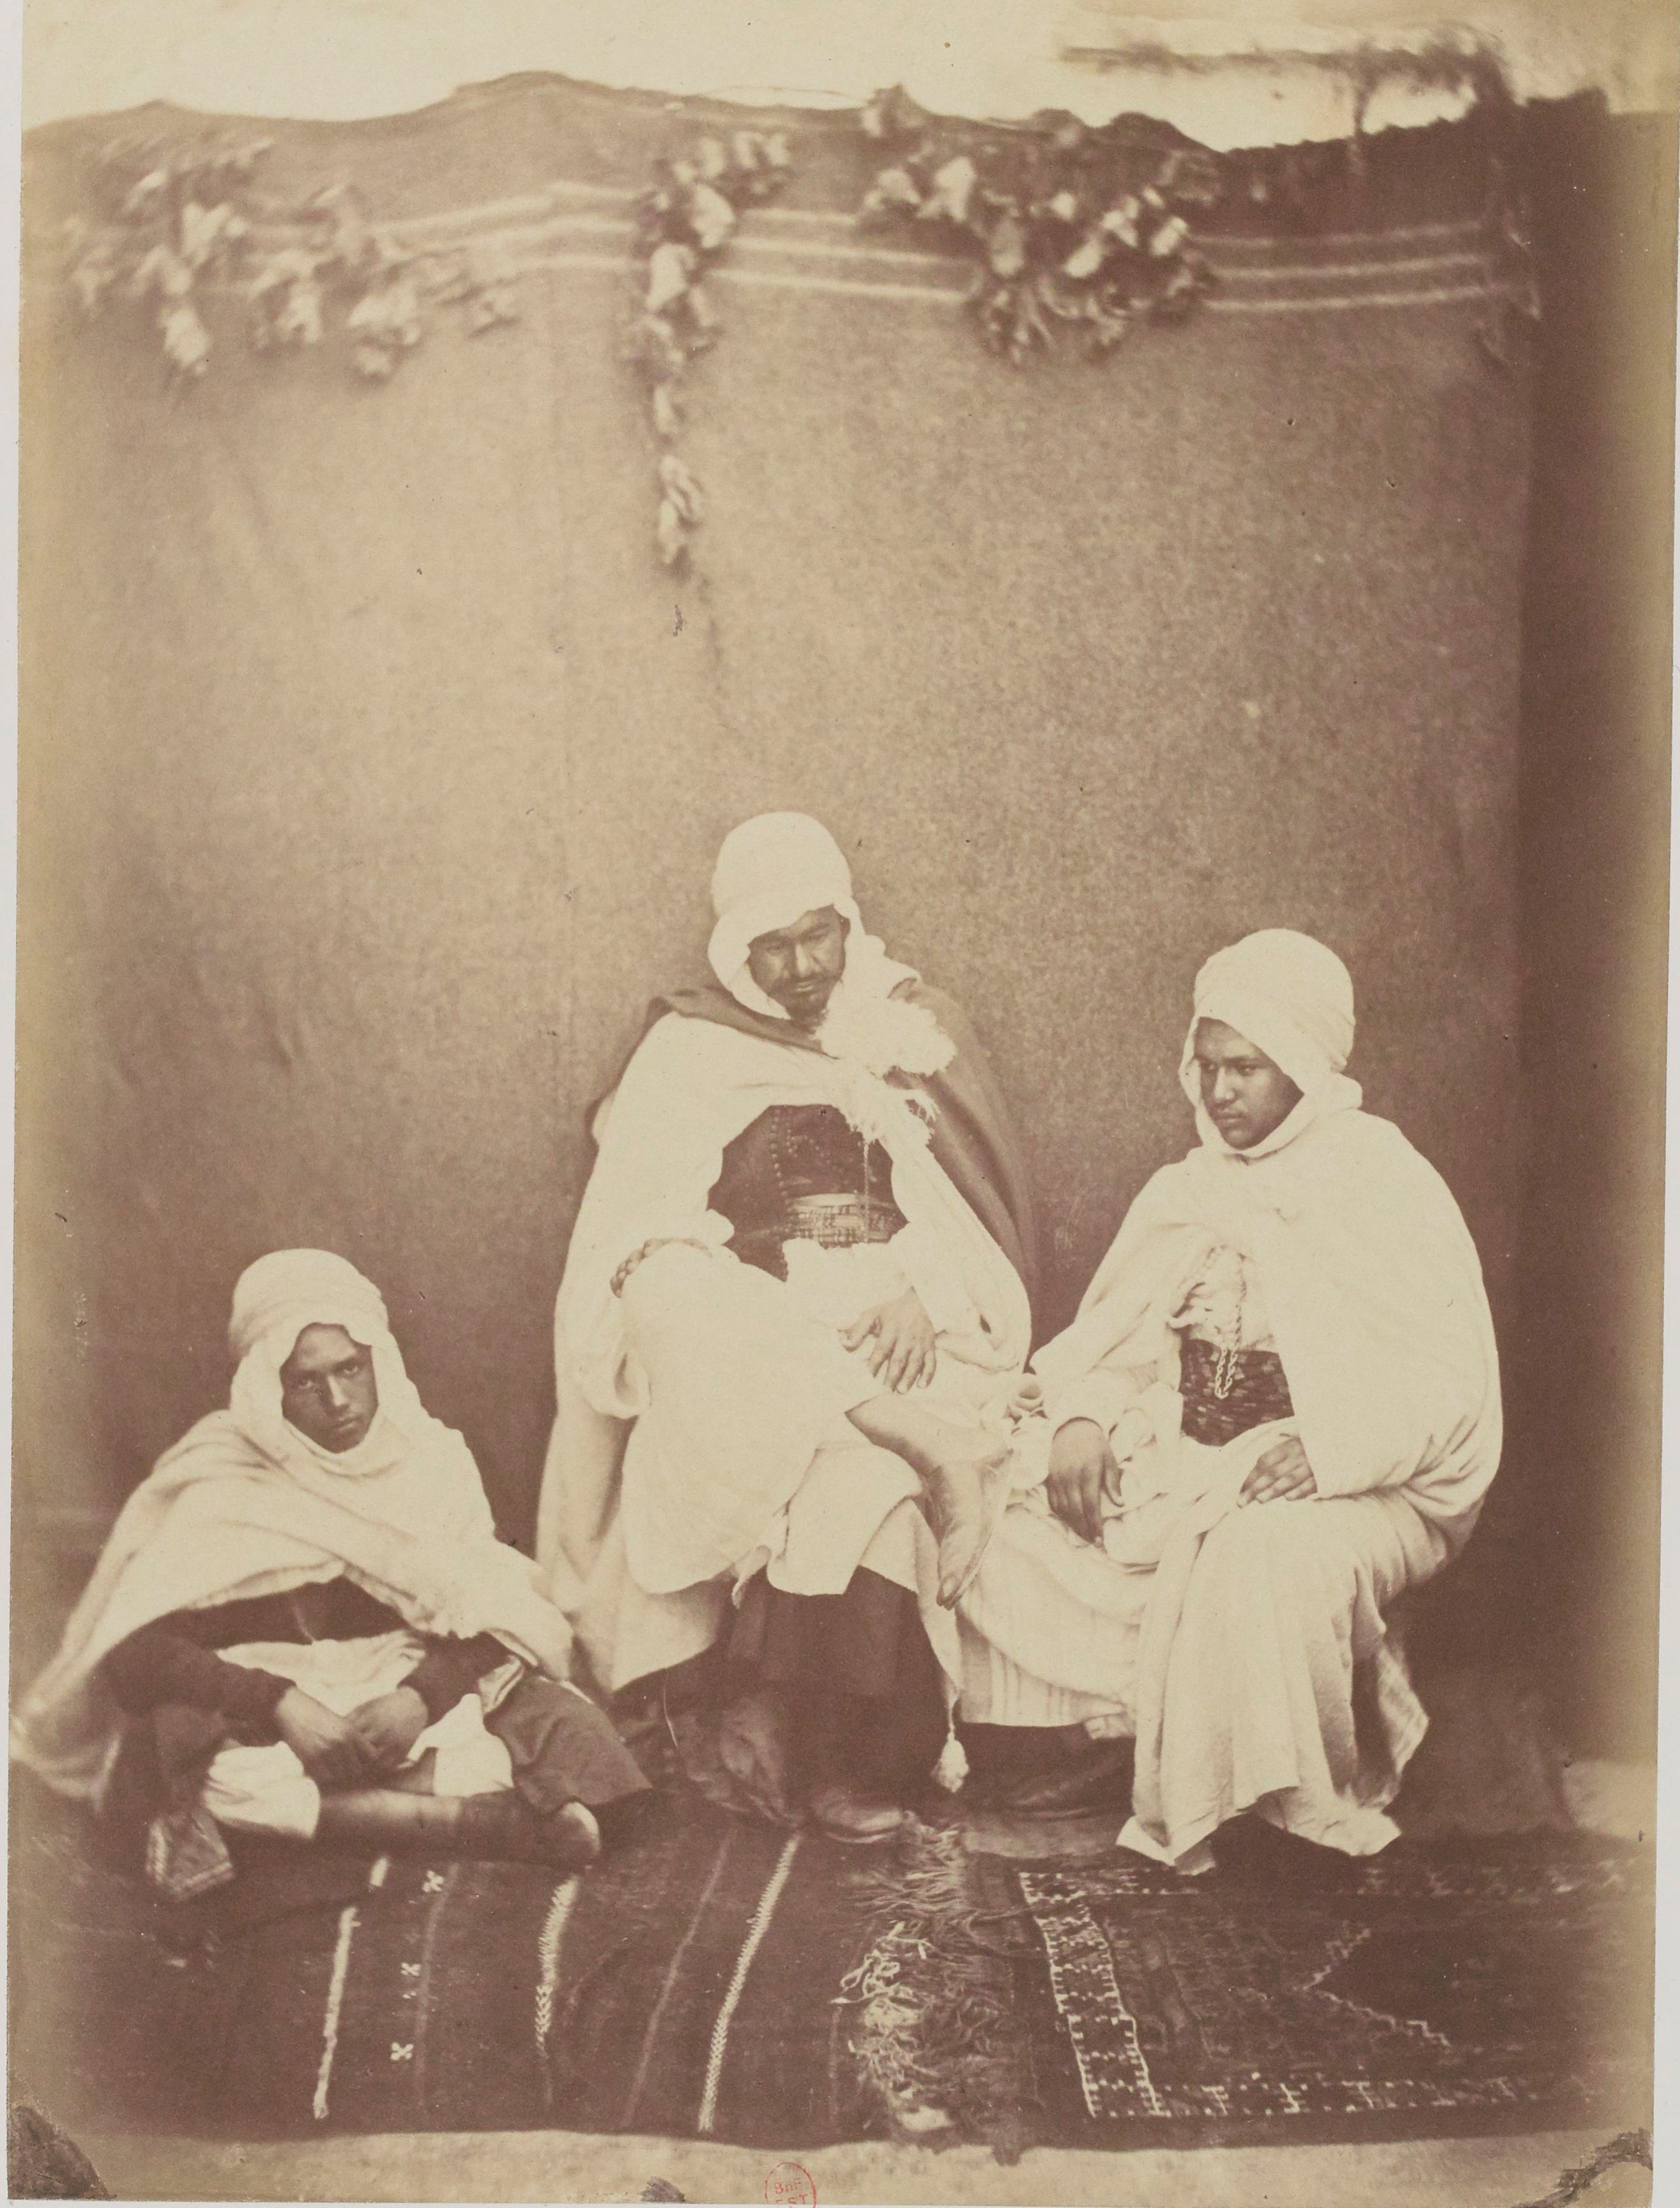 Муллех Сидик и два племянника, Мохаммед бен Абдалла и его младший брат (дети Бен-Абдаллы)